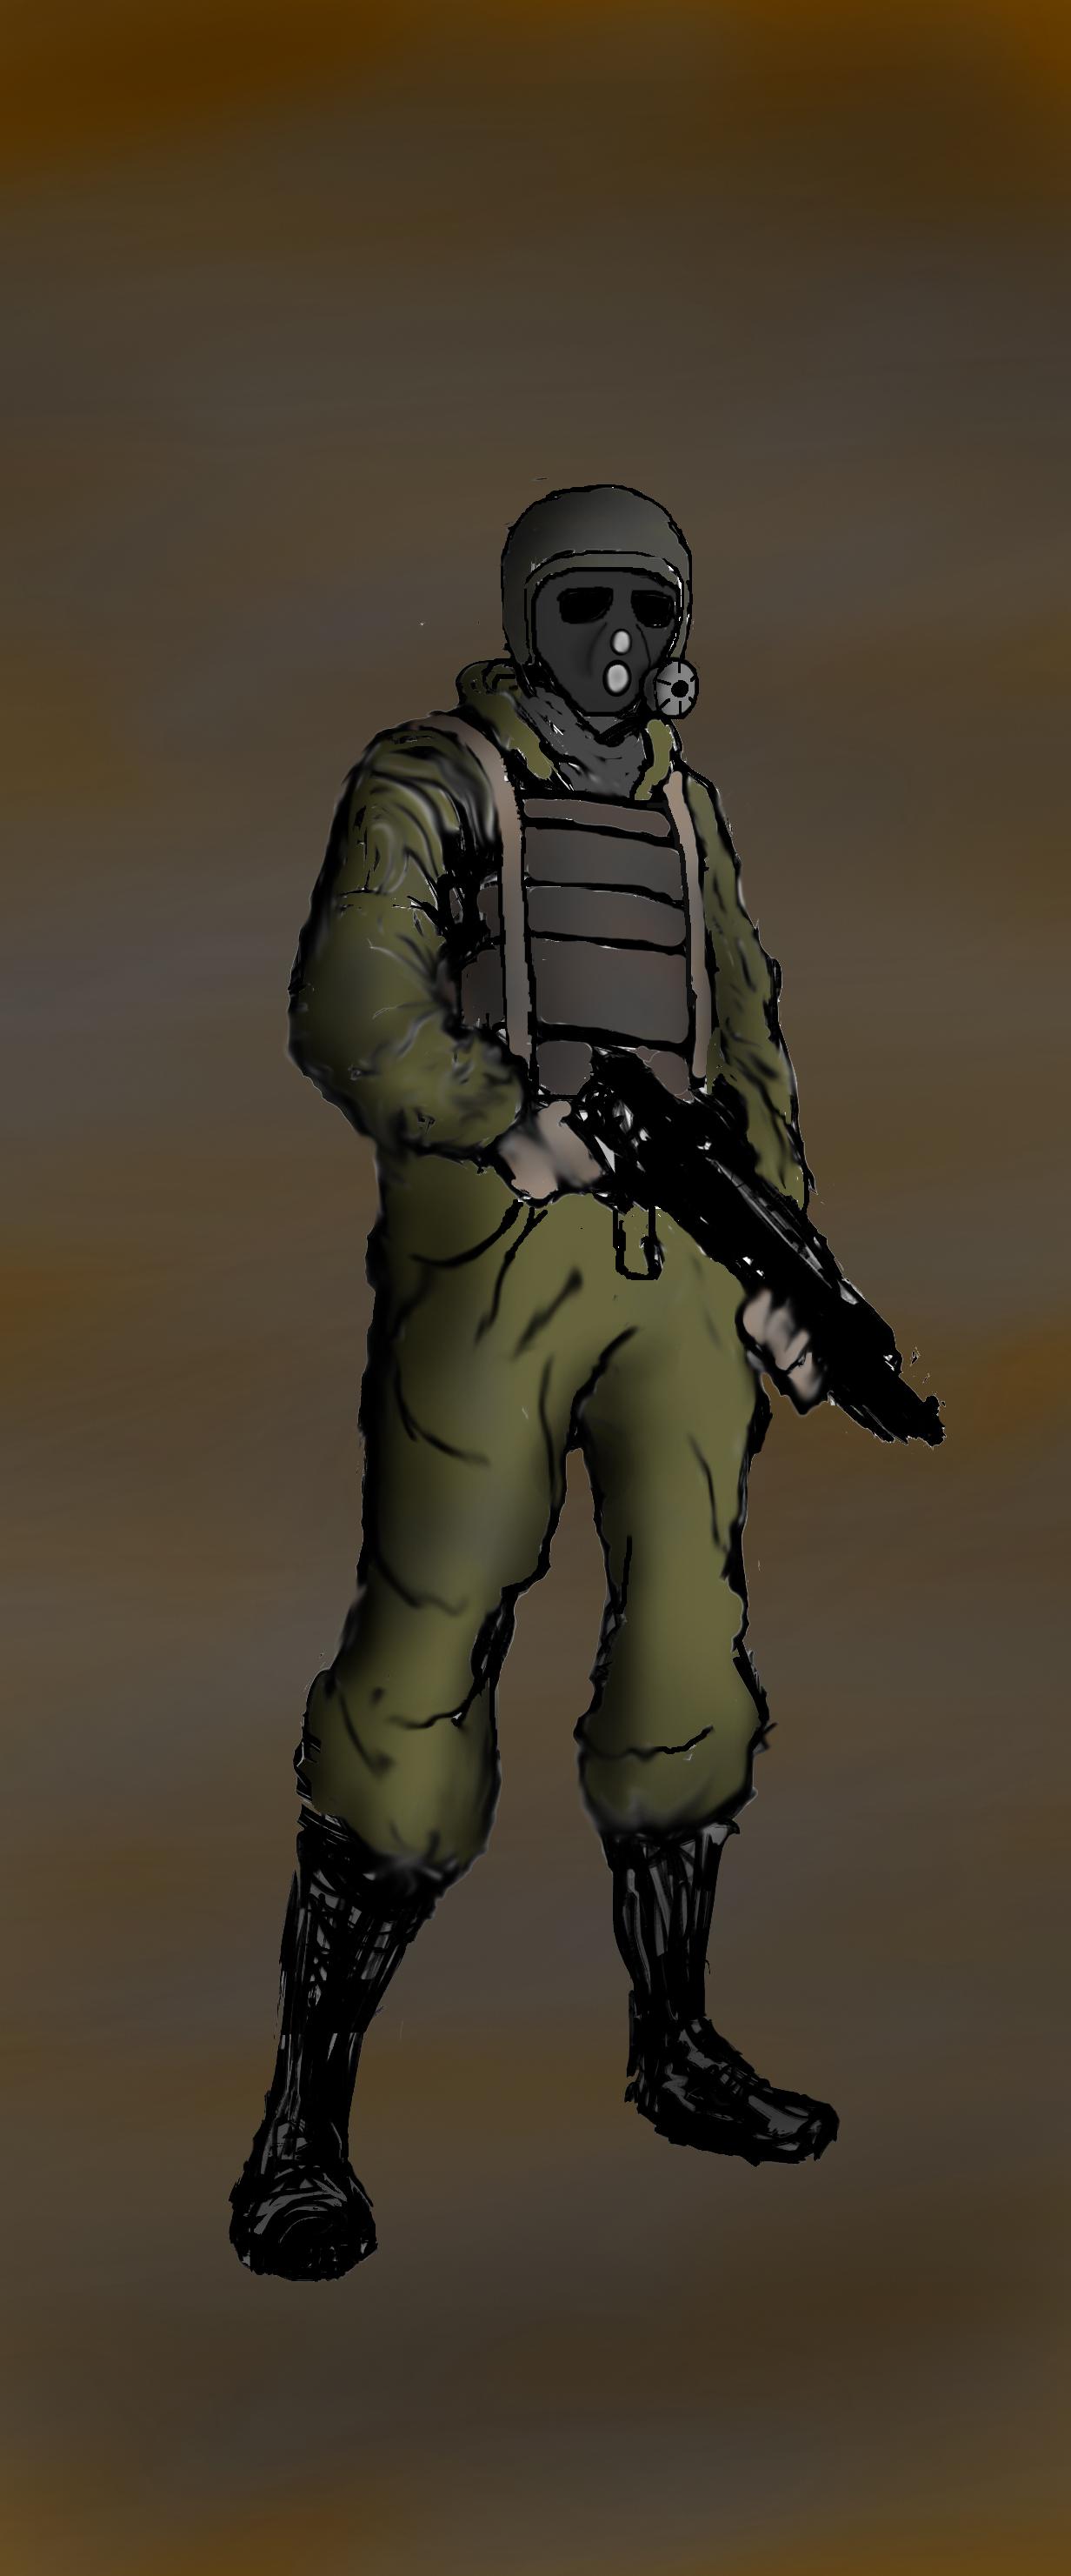 Conscript Image